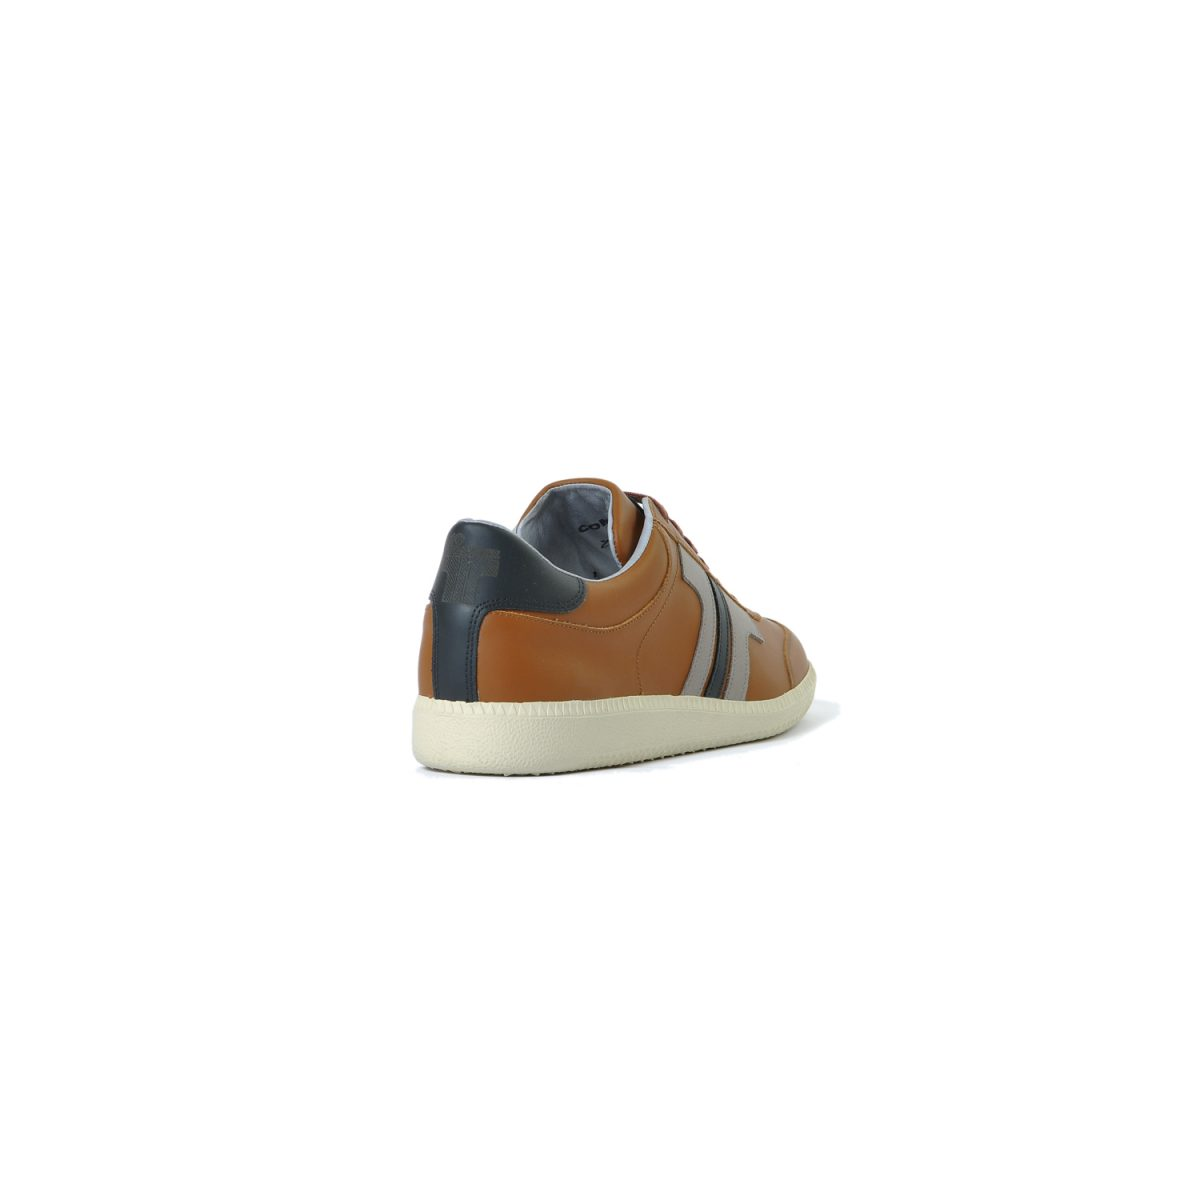 Tisza cipő - Compakt - Bronzbarna-szürke-fekete